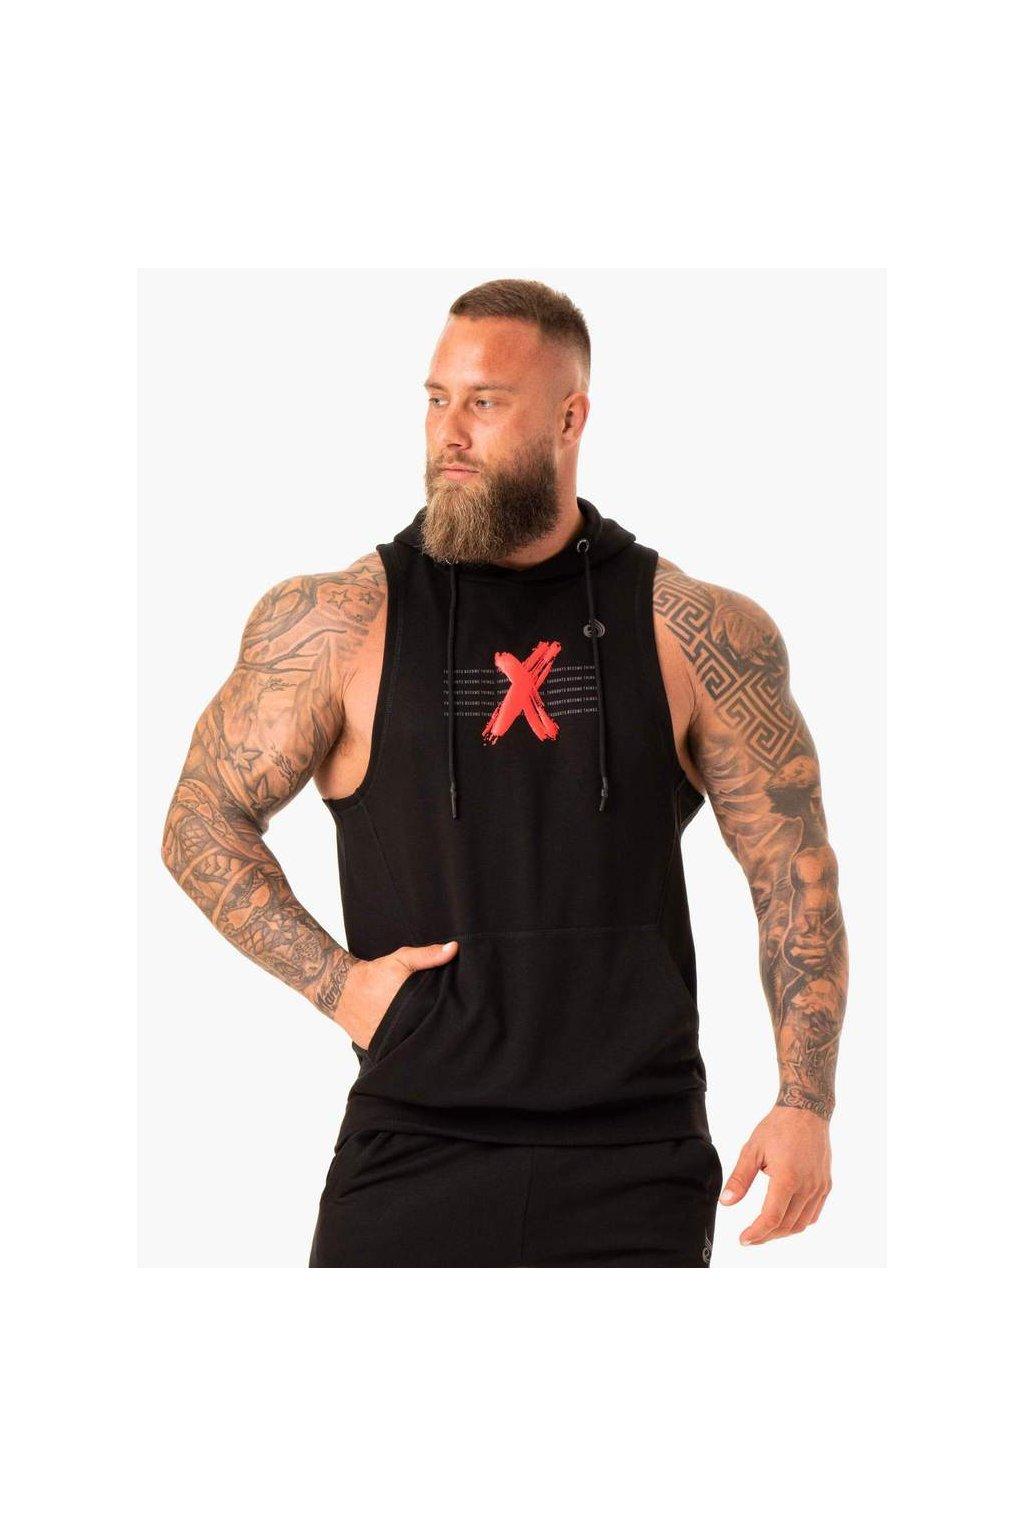 rwxkg sleeveless hoodie black clothing ryderwear 513621 1000x1000